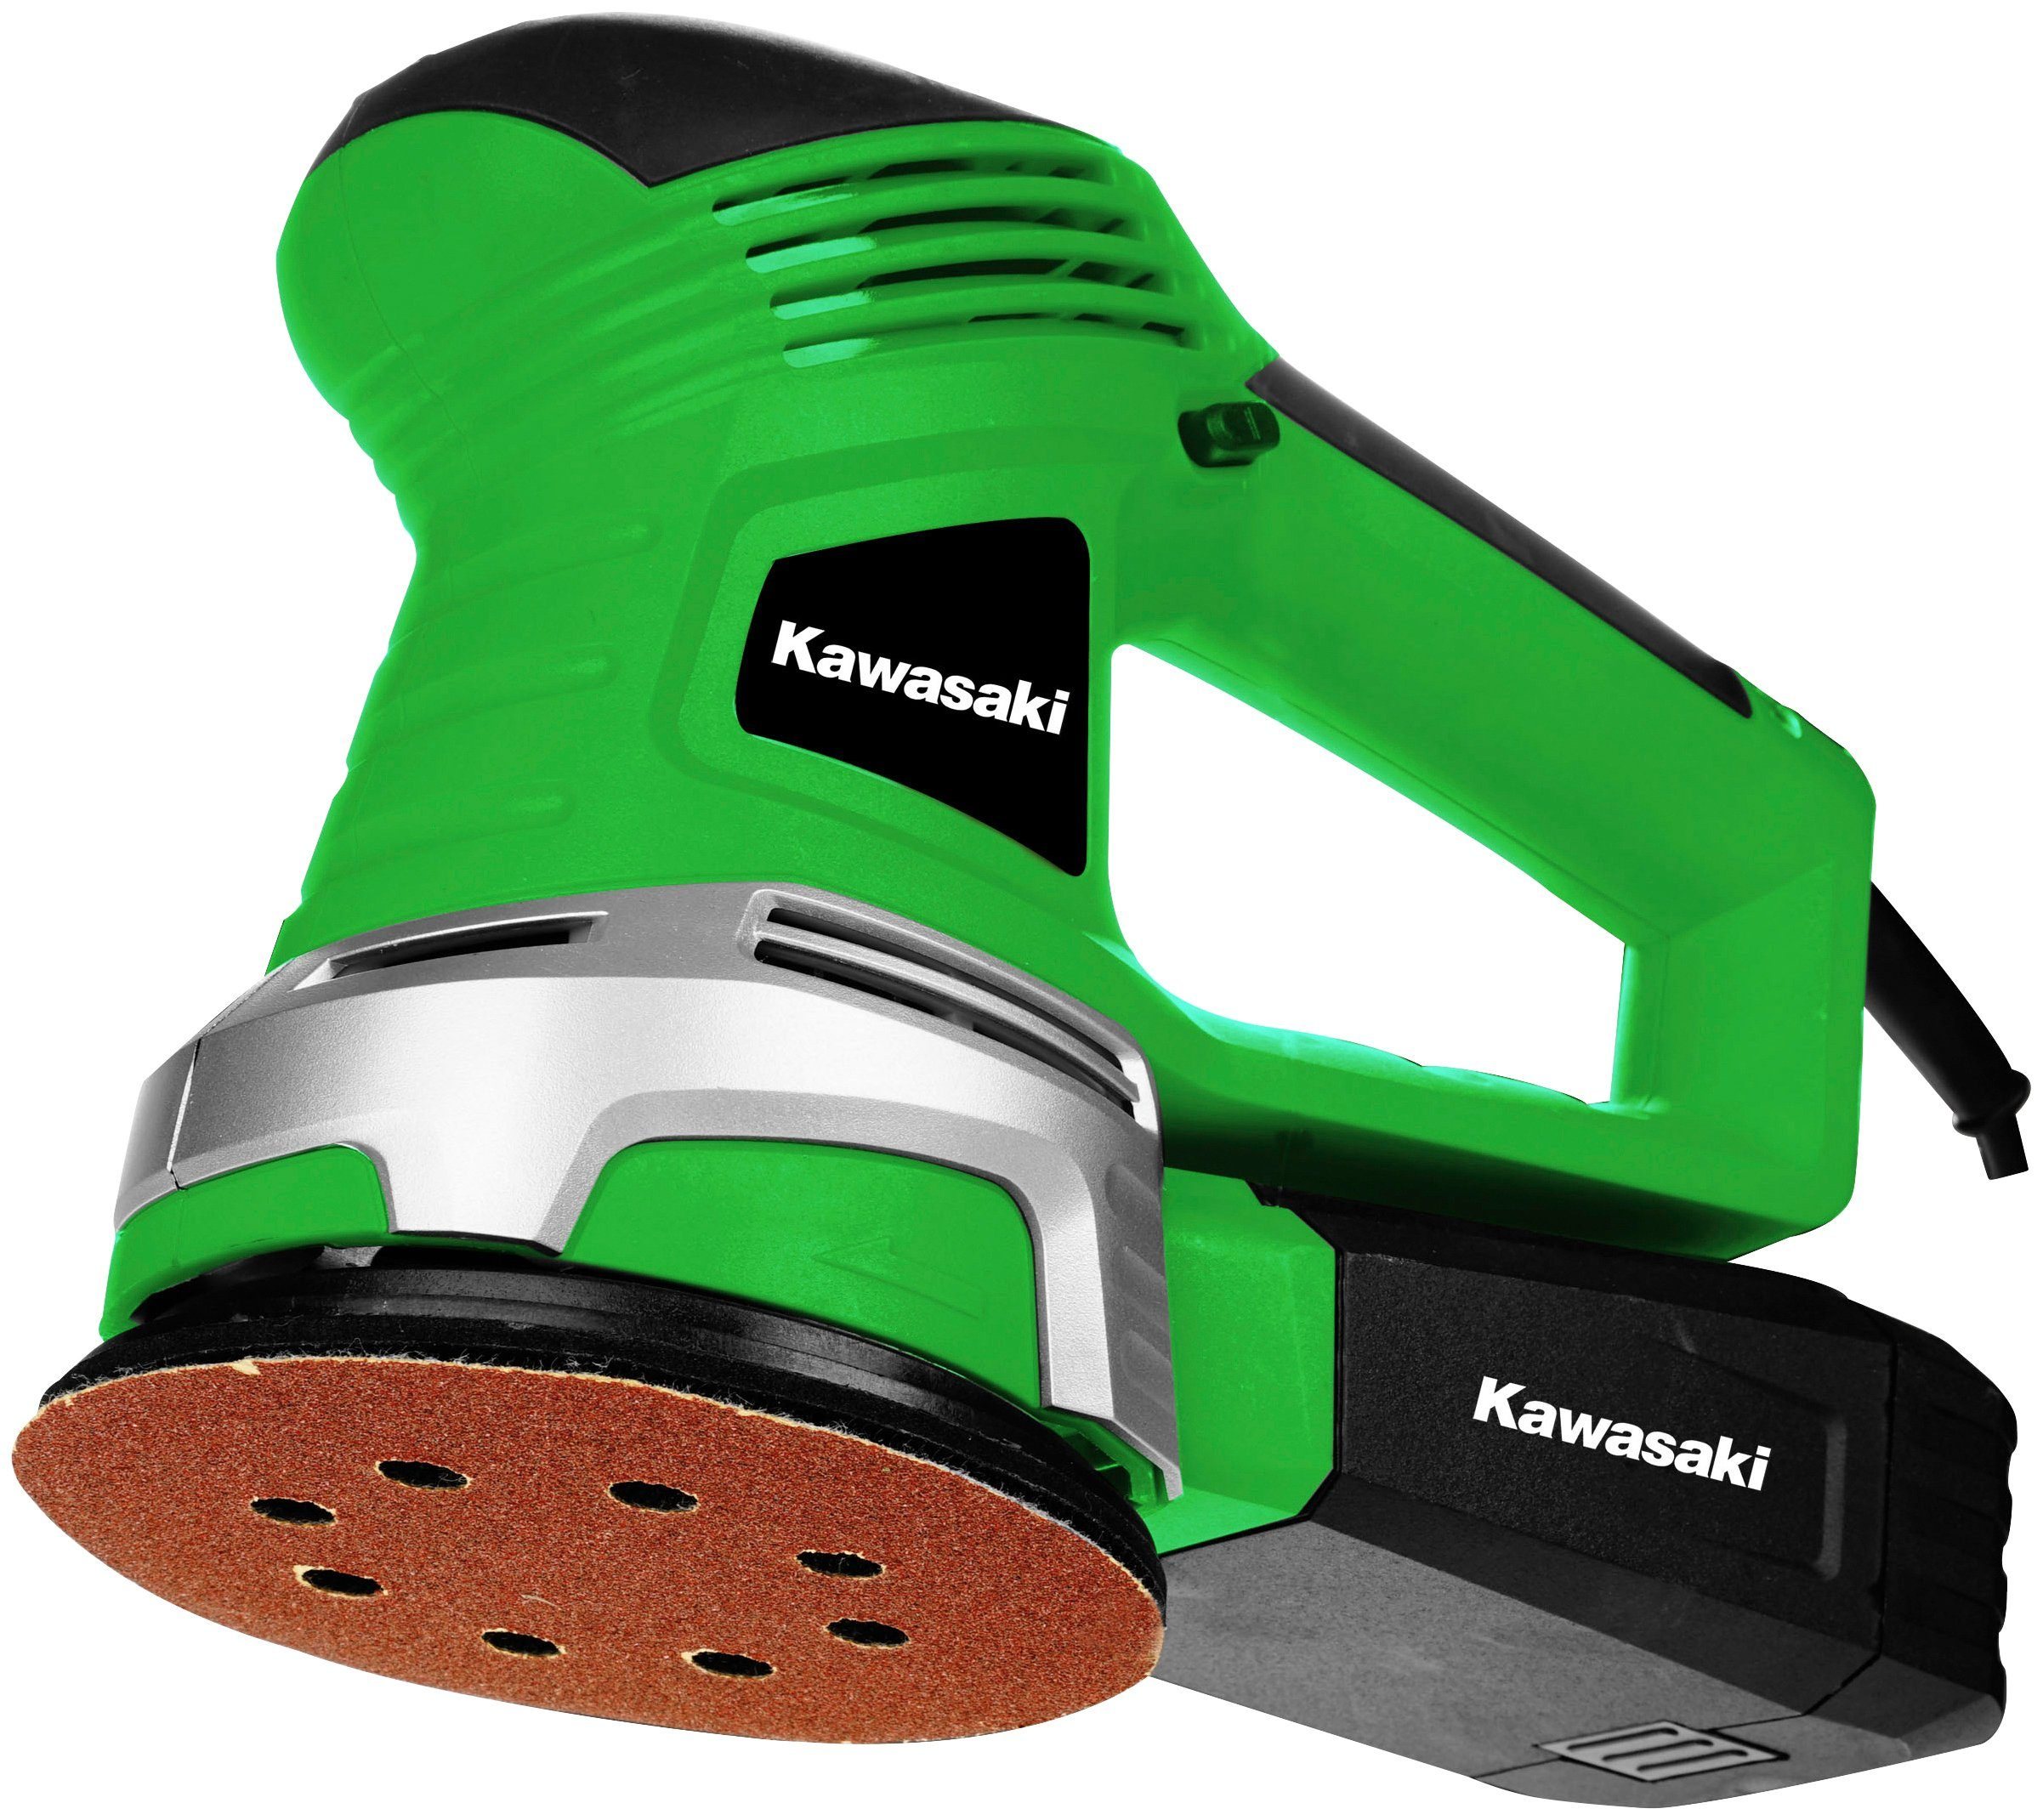 KAWASAKI Rundschleifer »K-RS 450-125«, 450 W